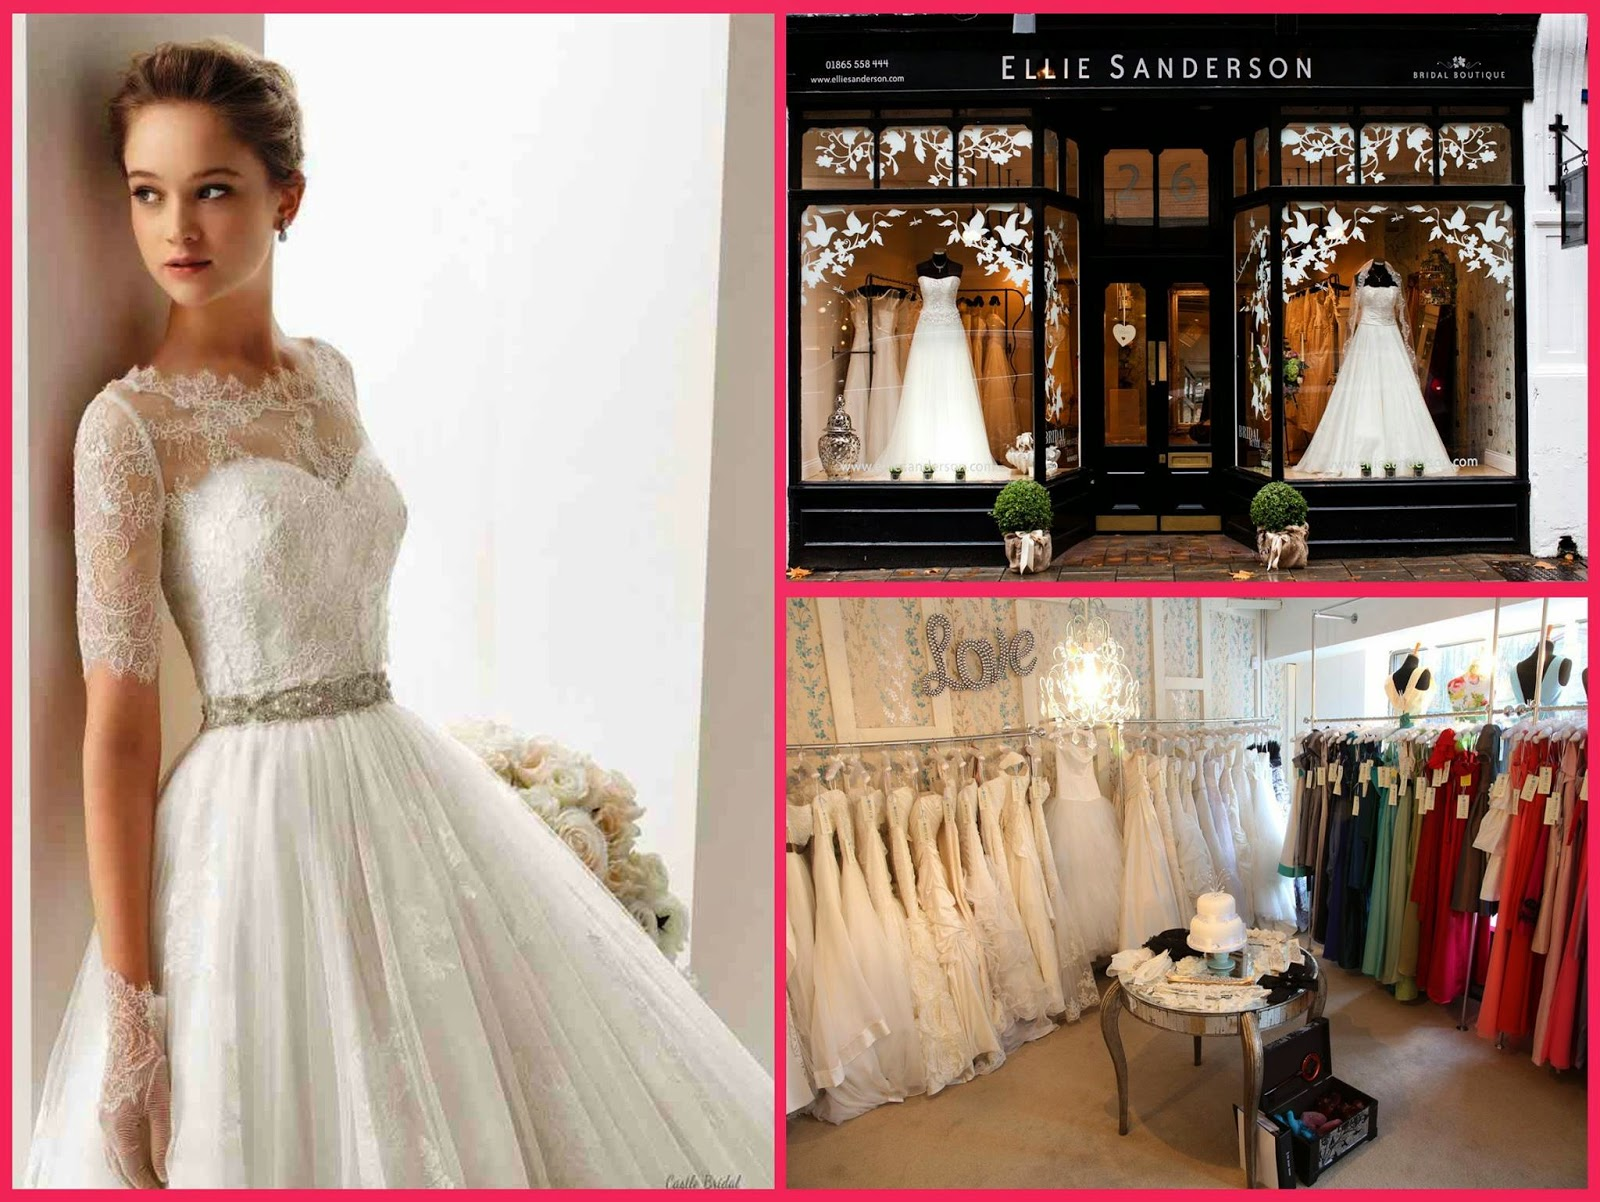 Small Business Ideas: Open A Bridal Shop